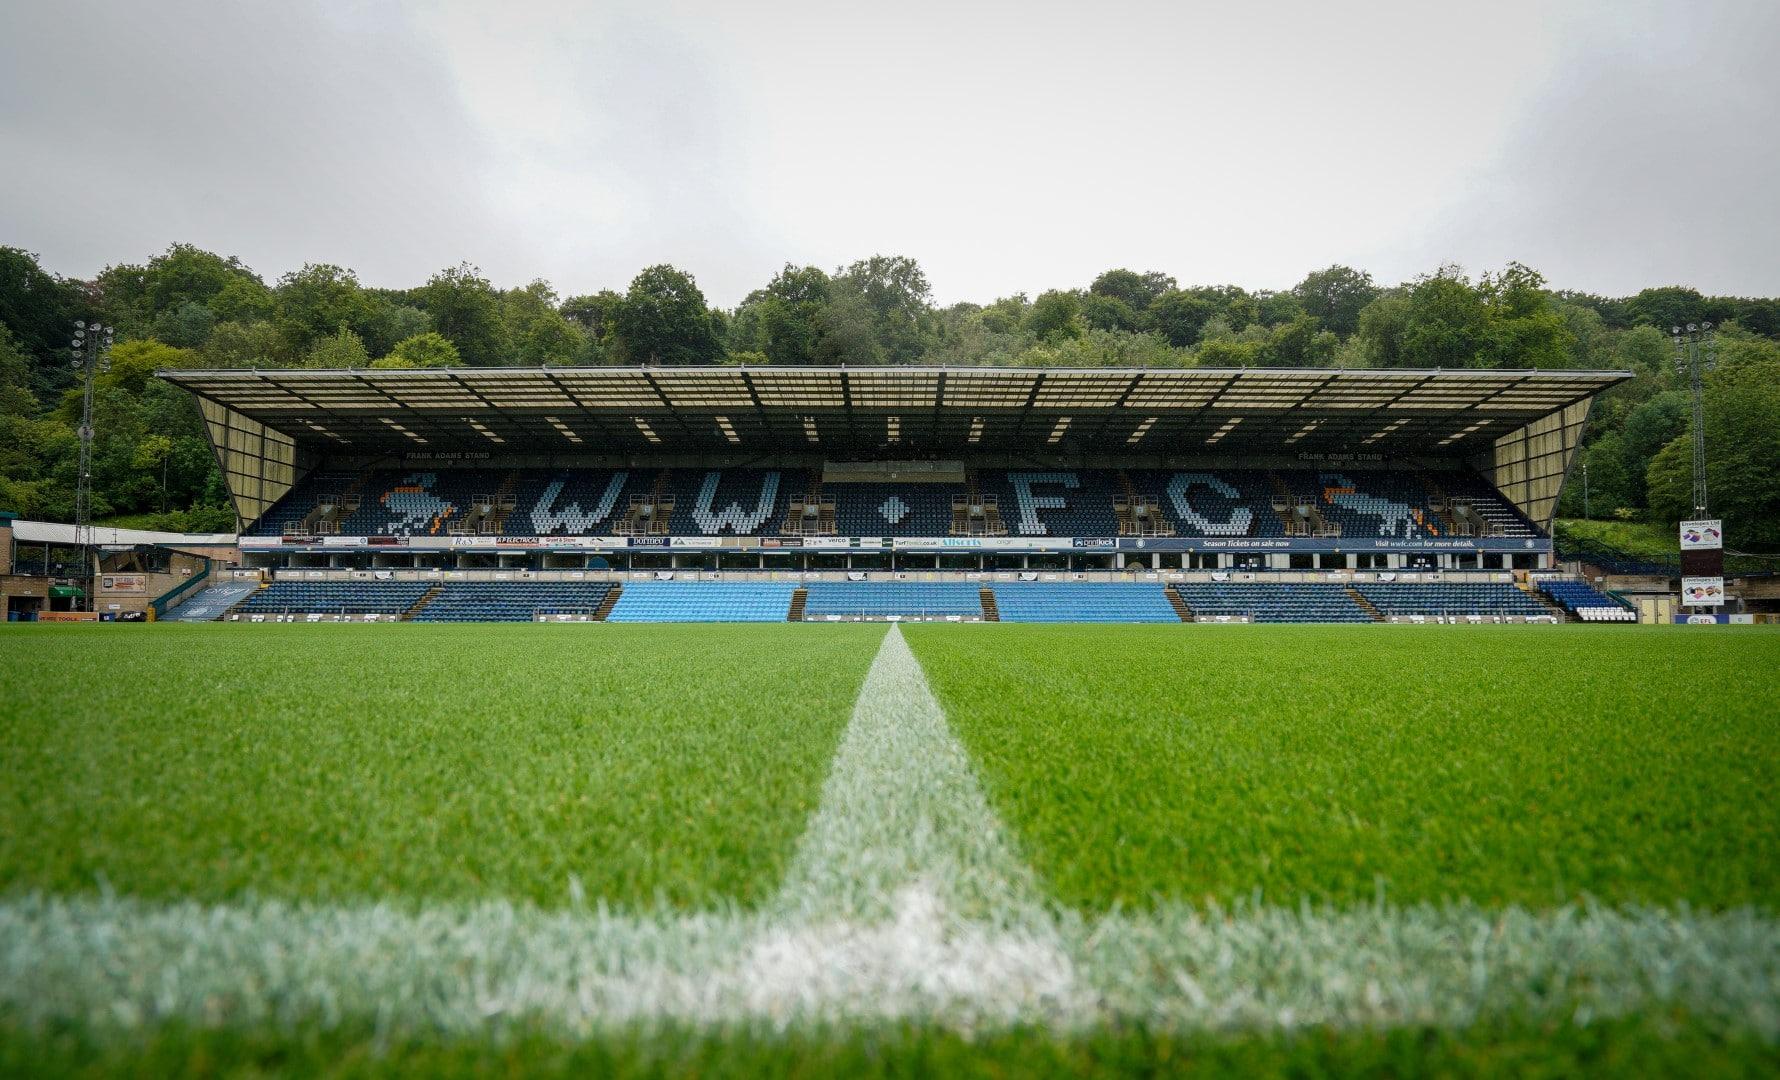 Wycombe Wanderers' Adams Park Stadium